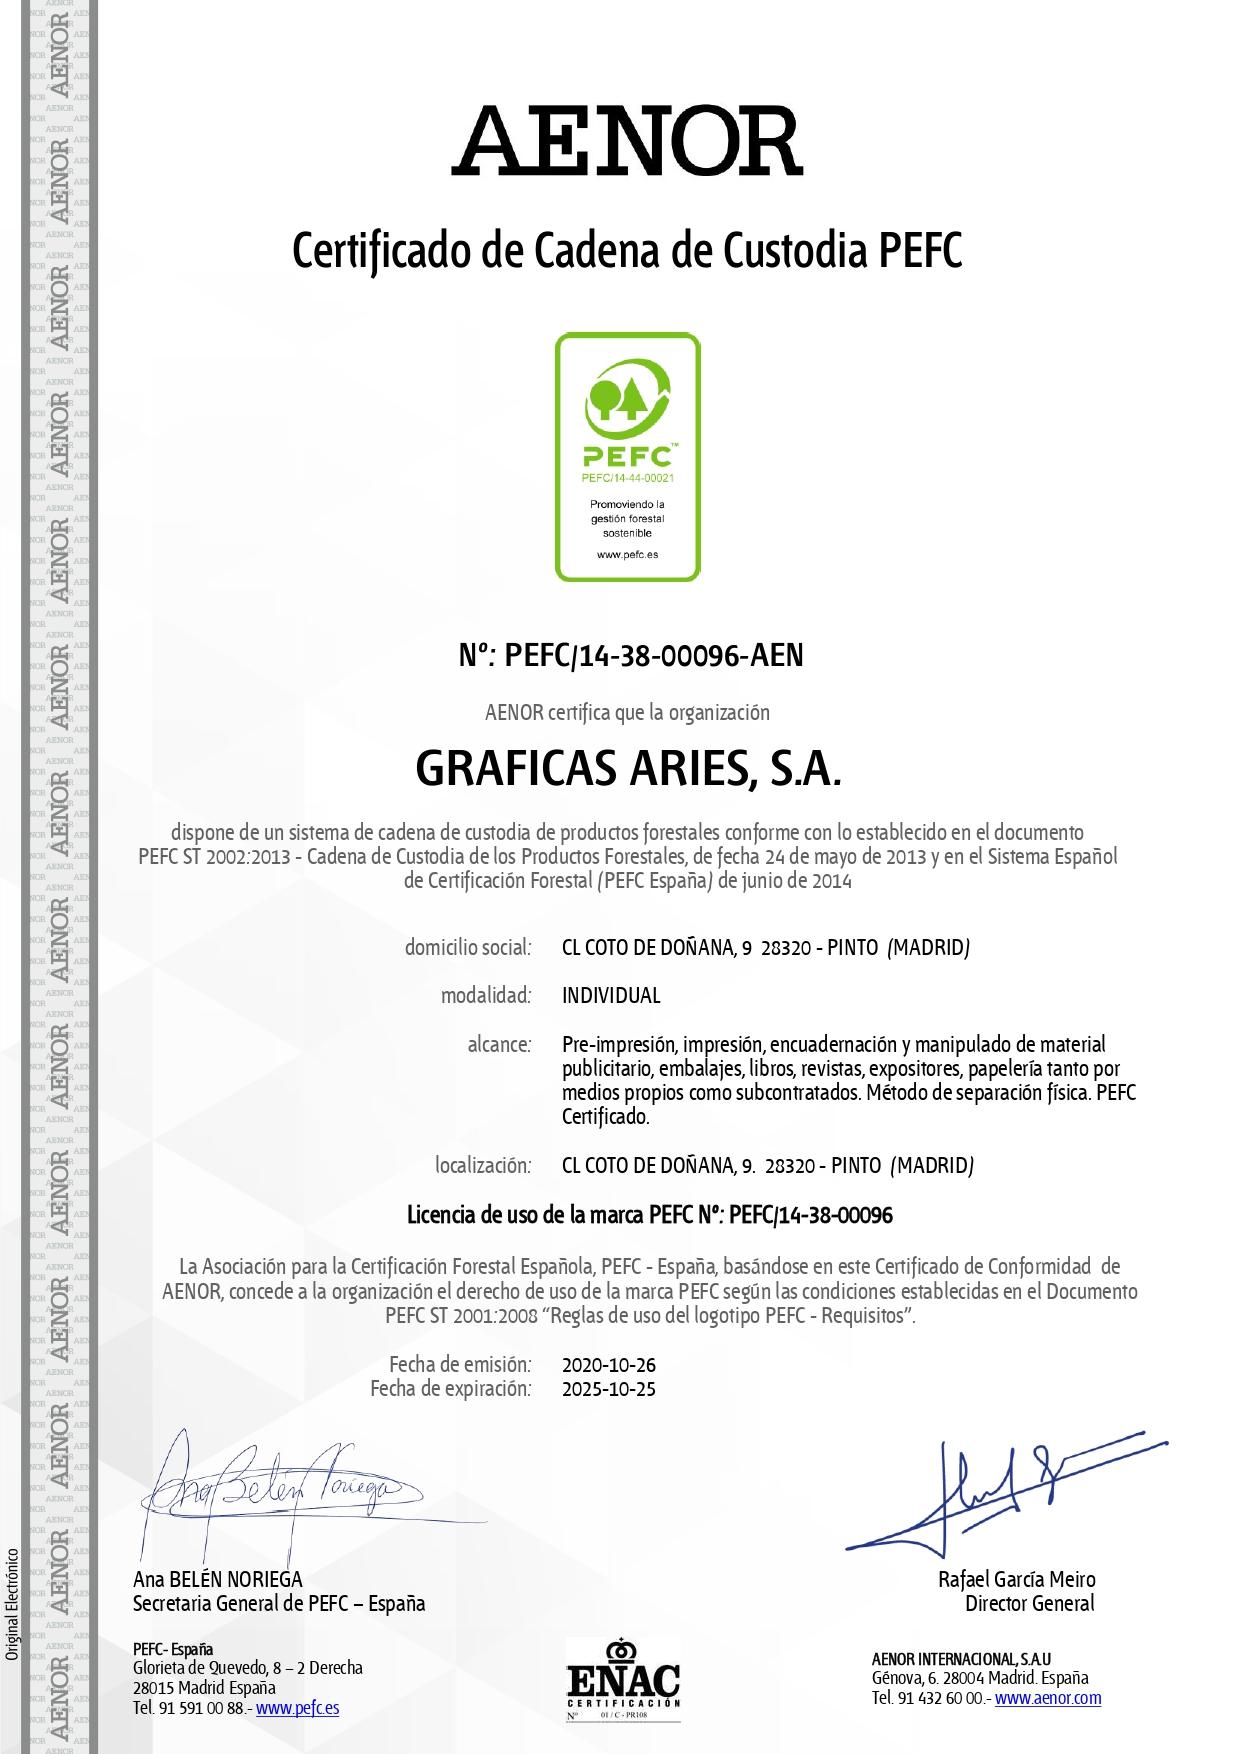 CERTIFICADO PEFC ARIES-AENOR valido hasta 25-10-2025